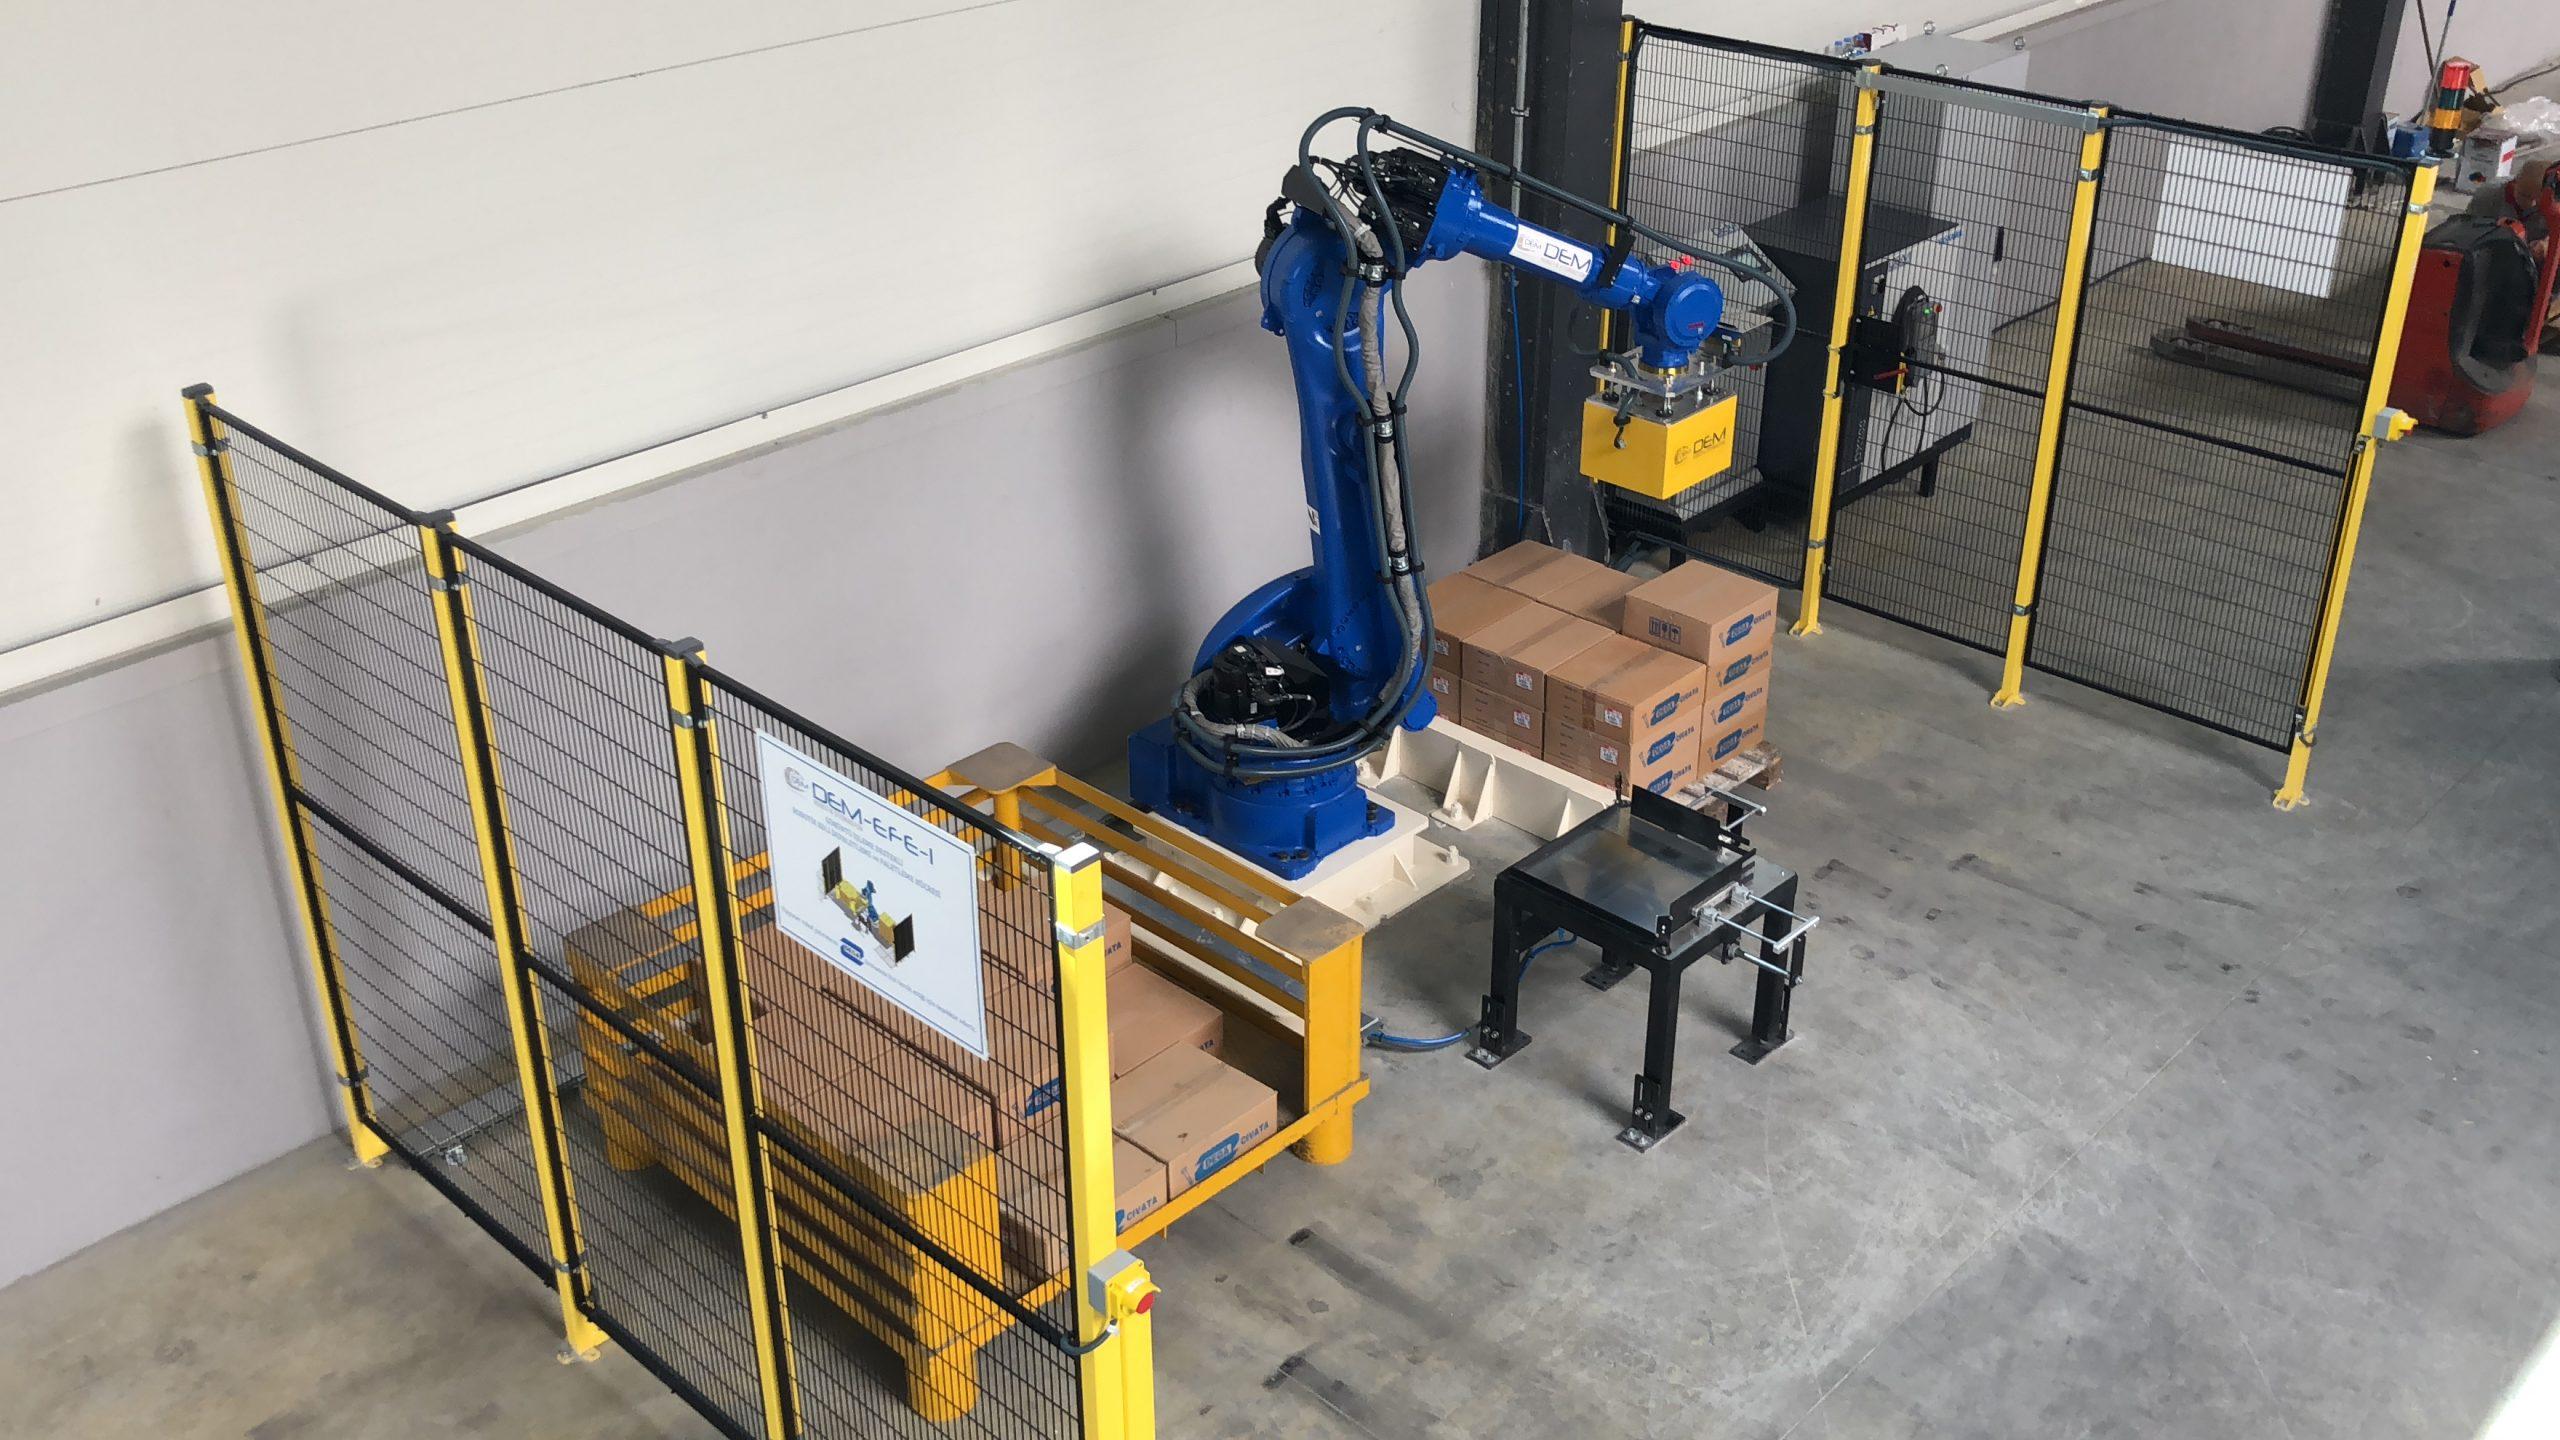 PALETLEME ROBOTU